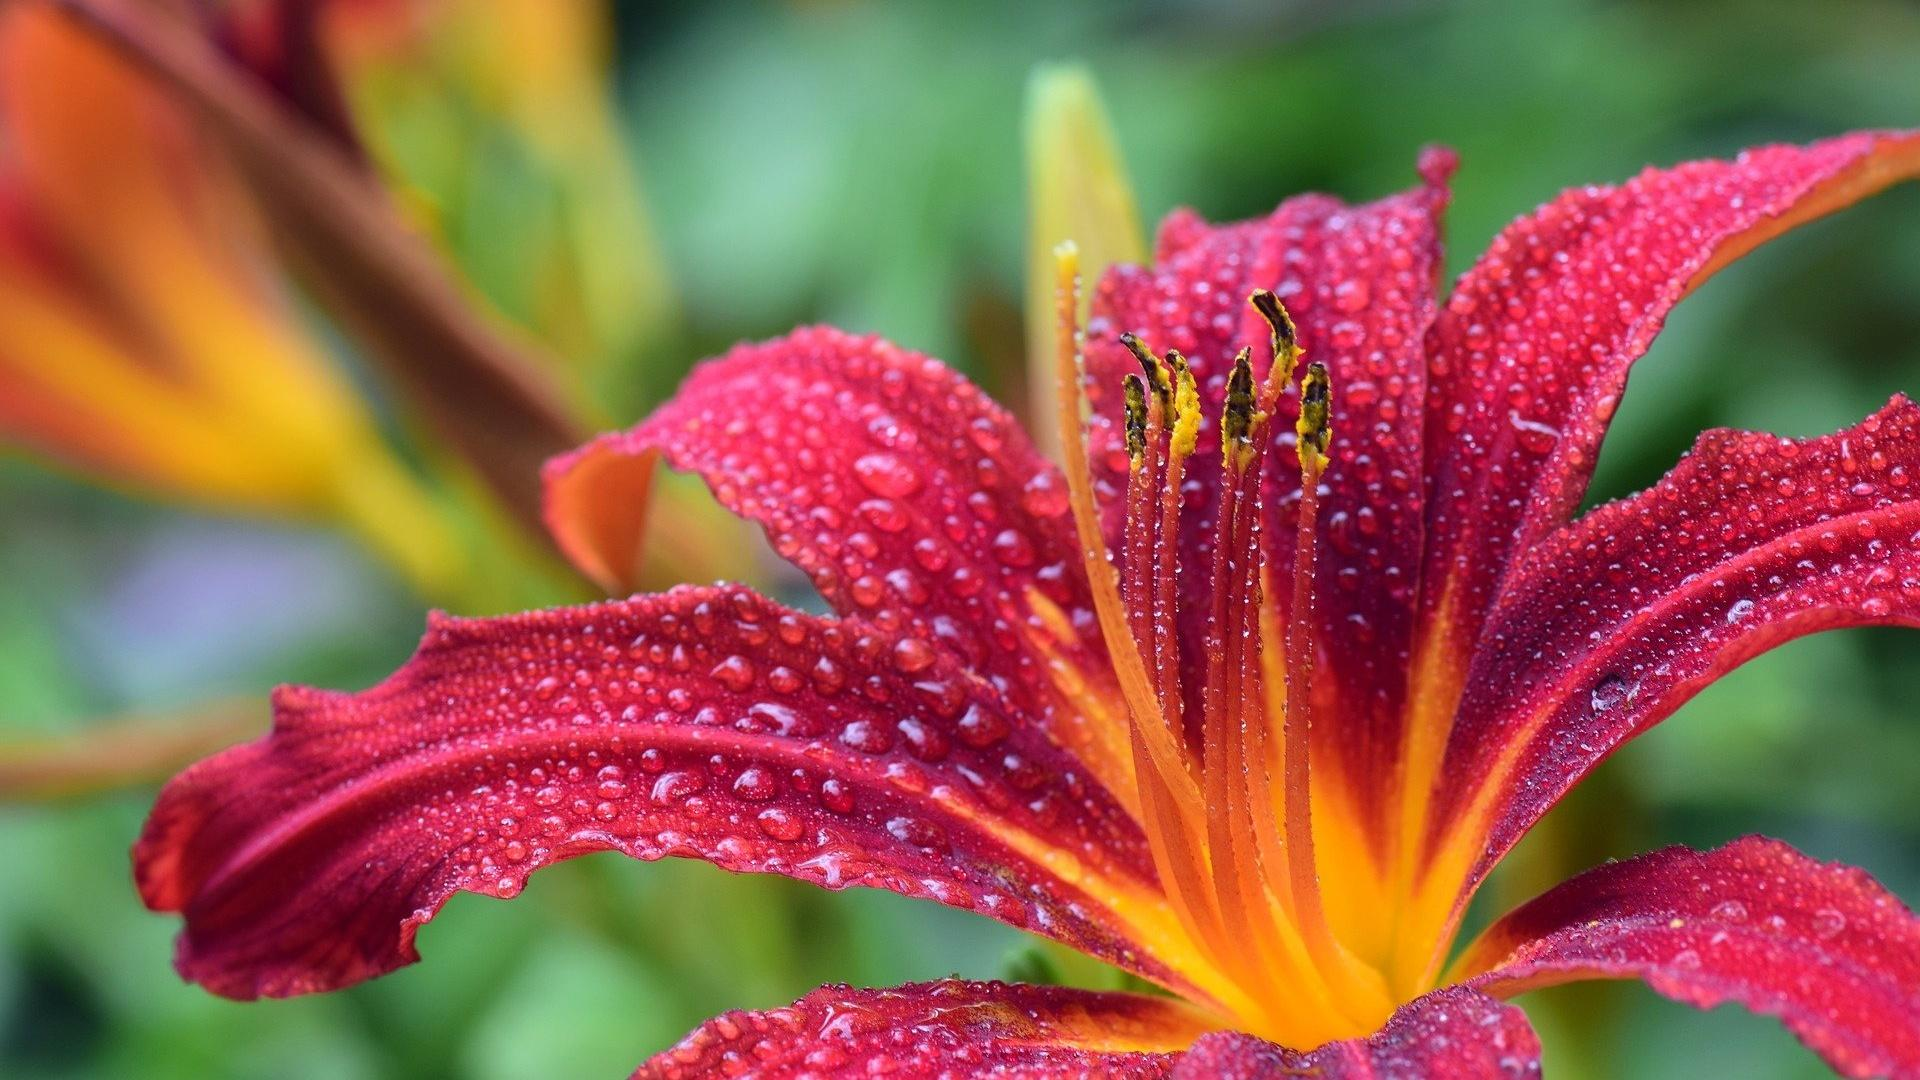 Lilien: Blütezeit der Pflanze